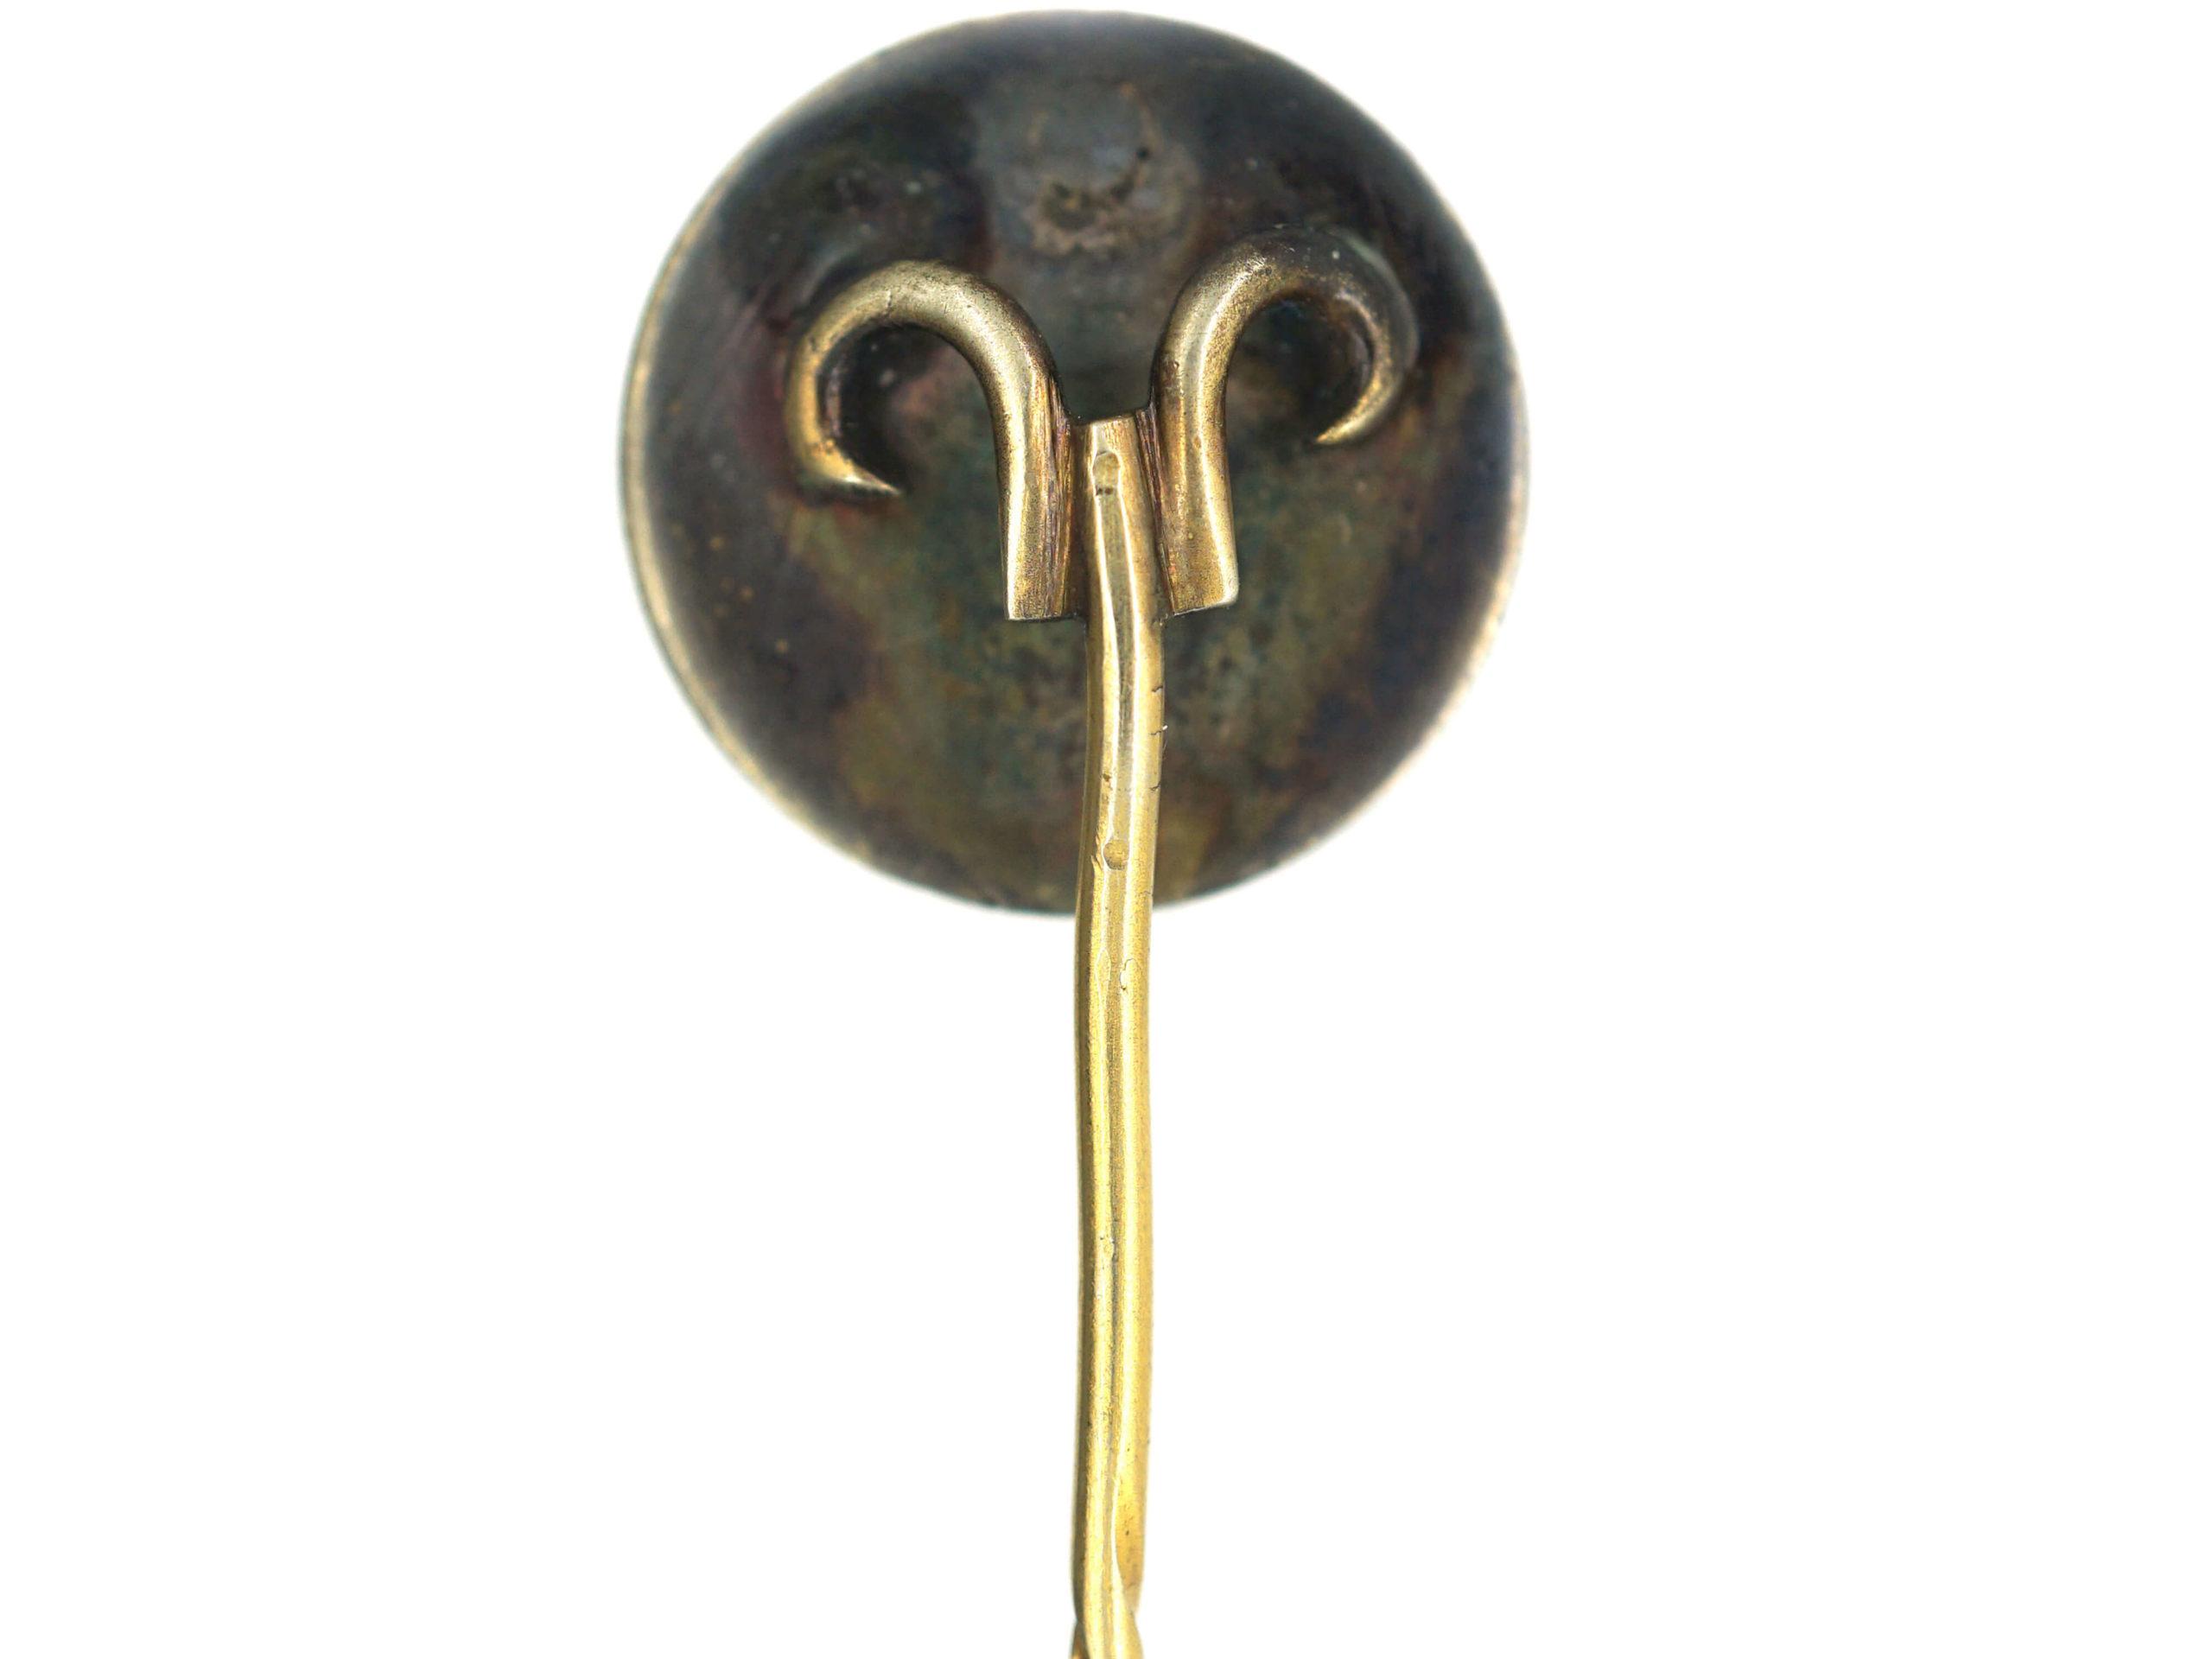 Victorian Silver Gilt & Enamel Four Pence Brittania Tie Pin